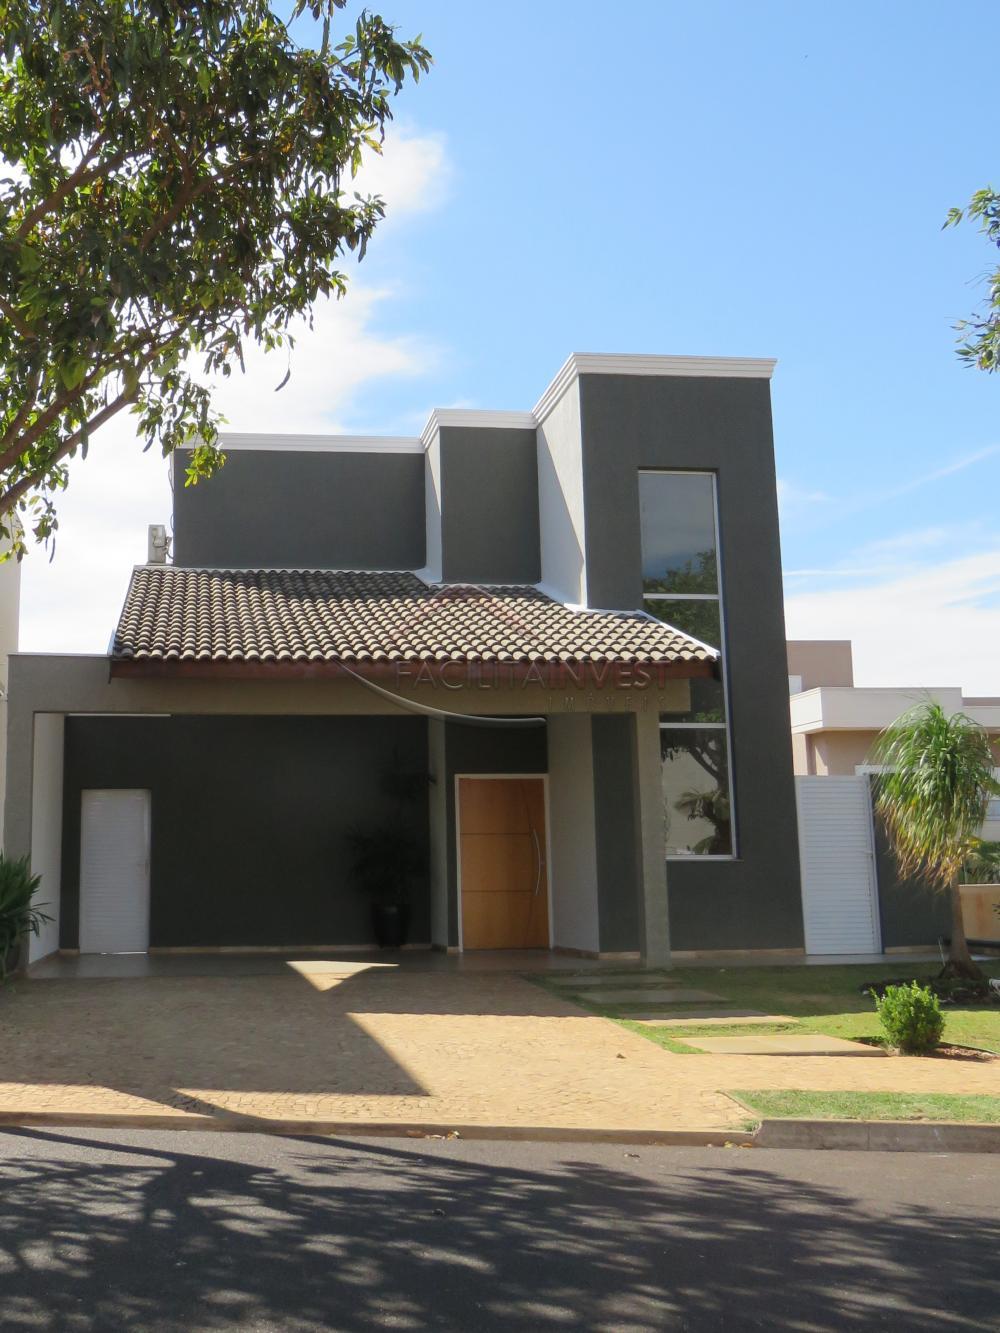 Ribeirao Preto Casa Venda R$710.000,00 Condominio R$350,00 3 Dormitorios 1 Suite Area do terreno 250.00m2 Area construida 179.00m2